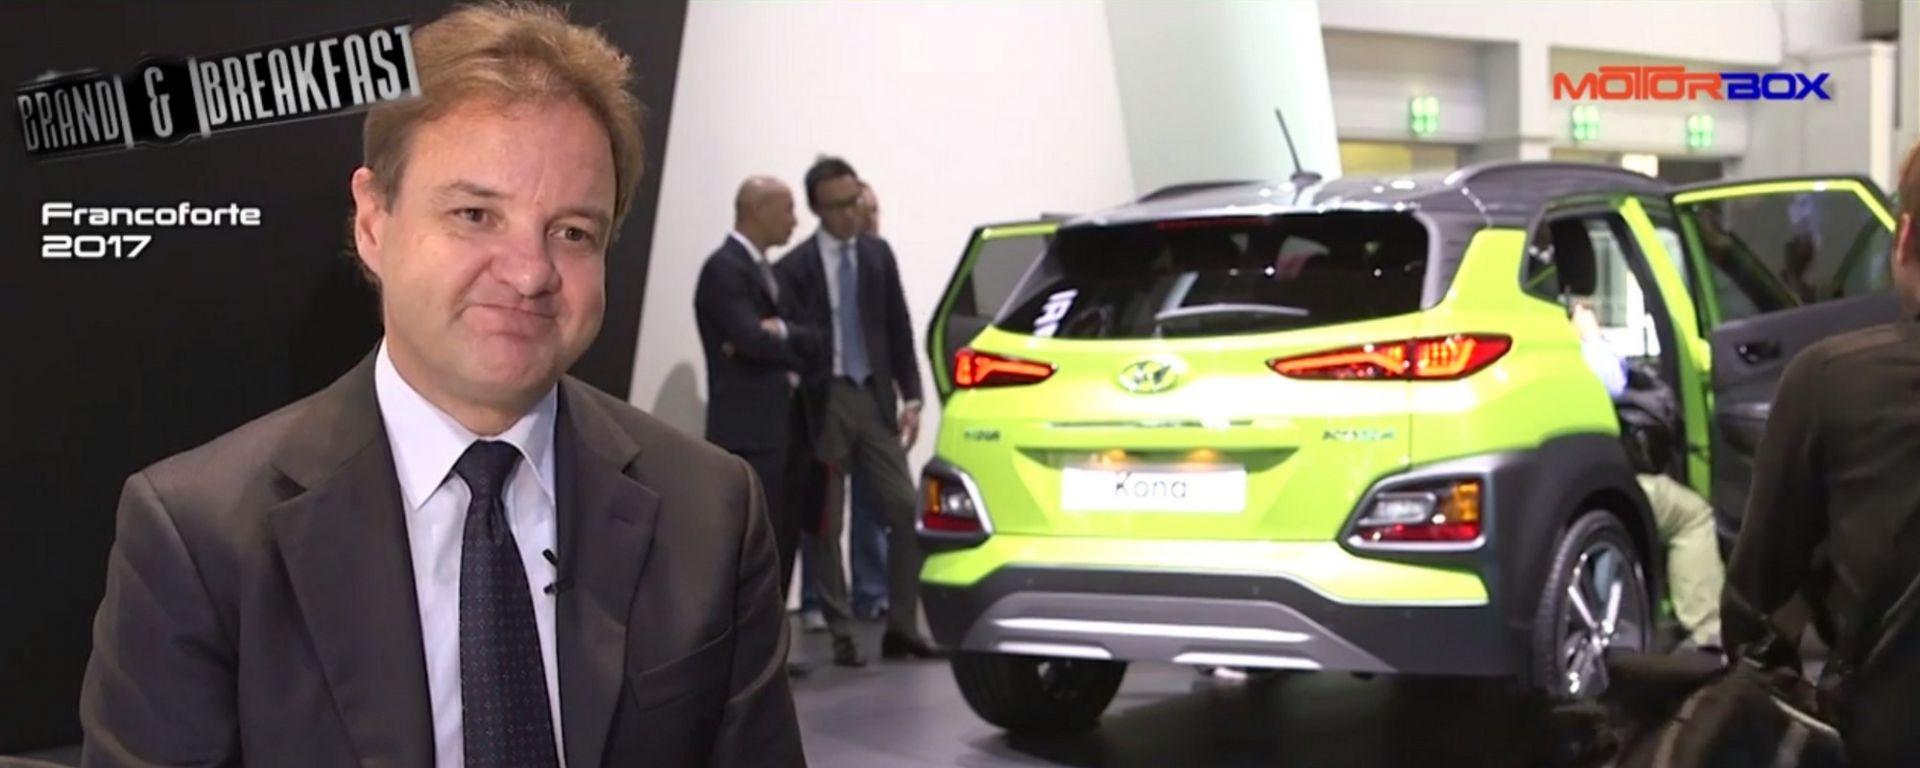 Le novità Hyundai raccontate da Andrea Crespi, Managing Director Hyundai Motor Company Italy